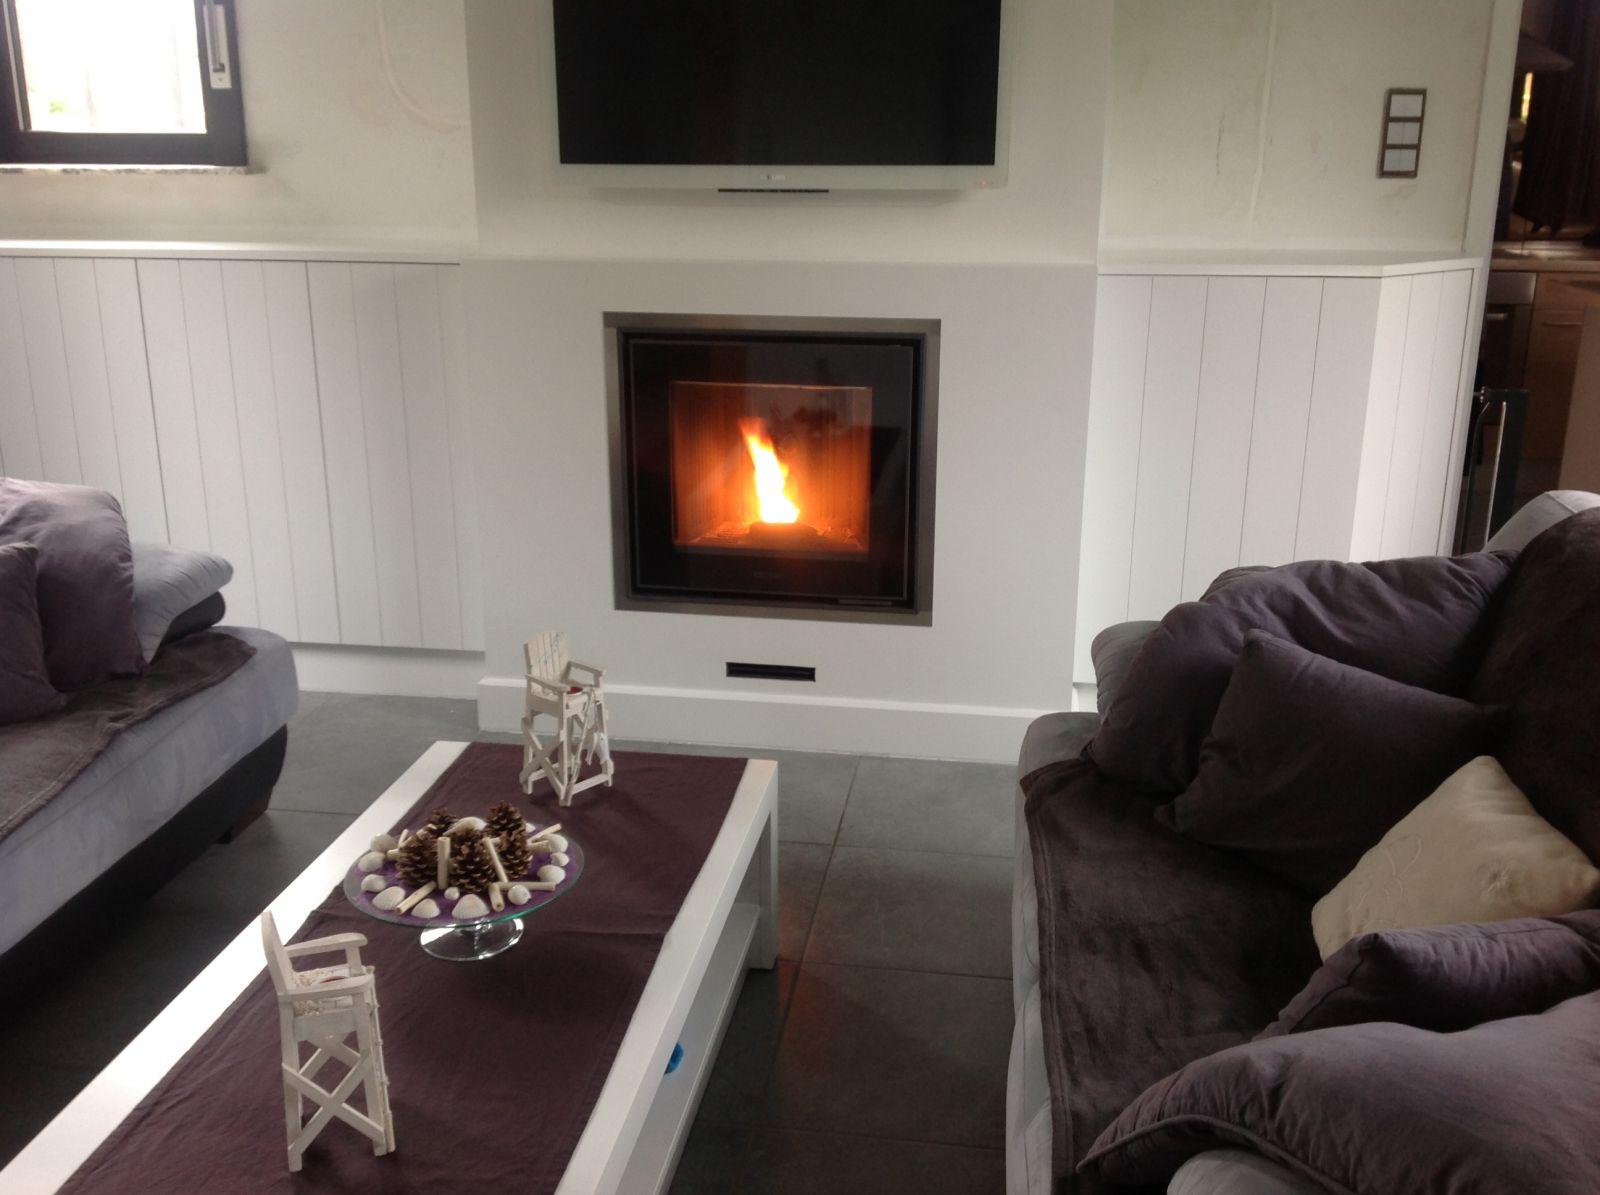 piazzetta mp 973 15 kw id pellets. Black Bedroom Furniture Sets. Home Design Ideas